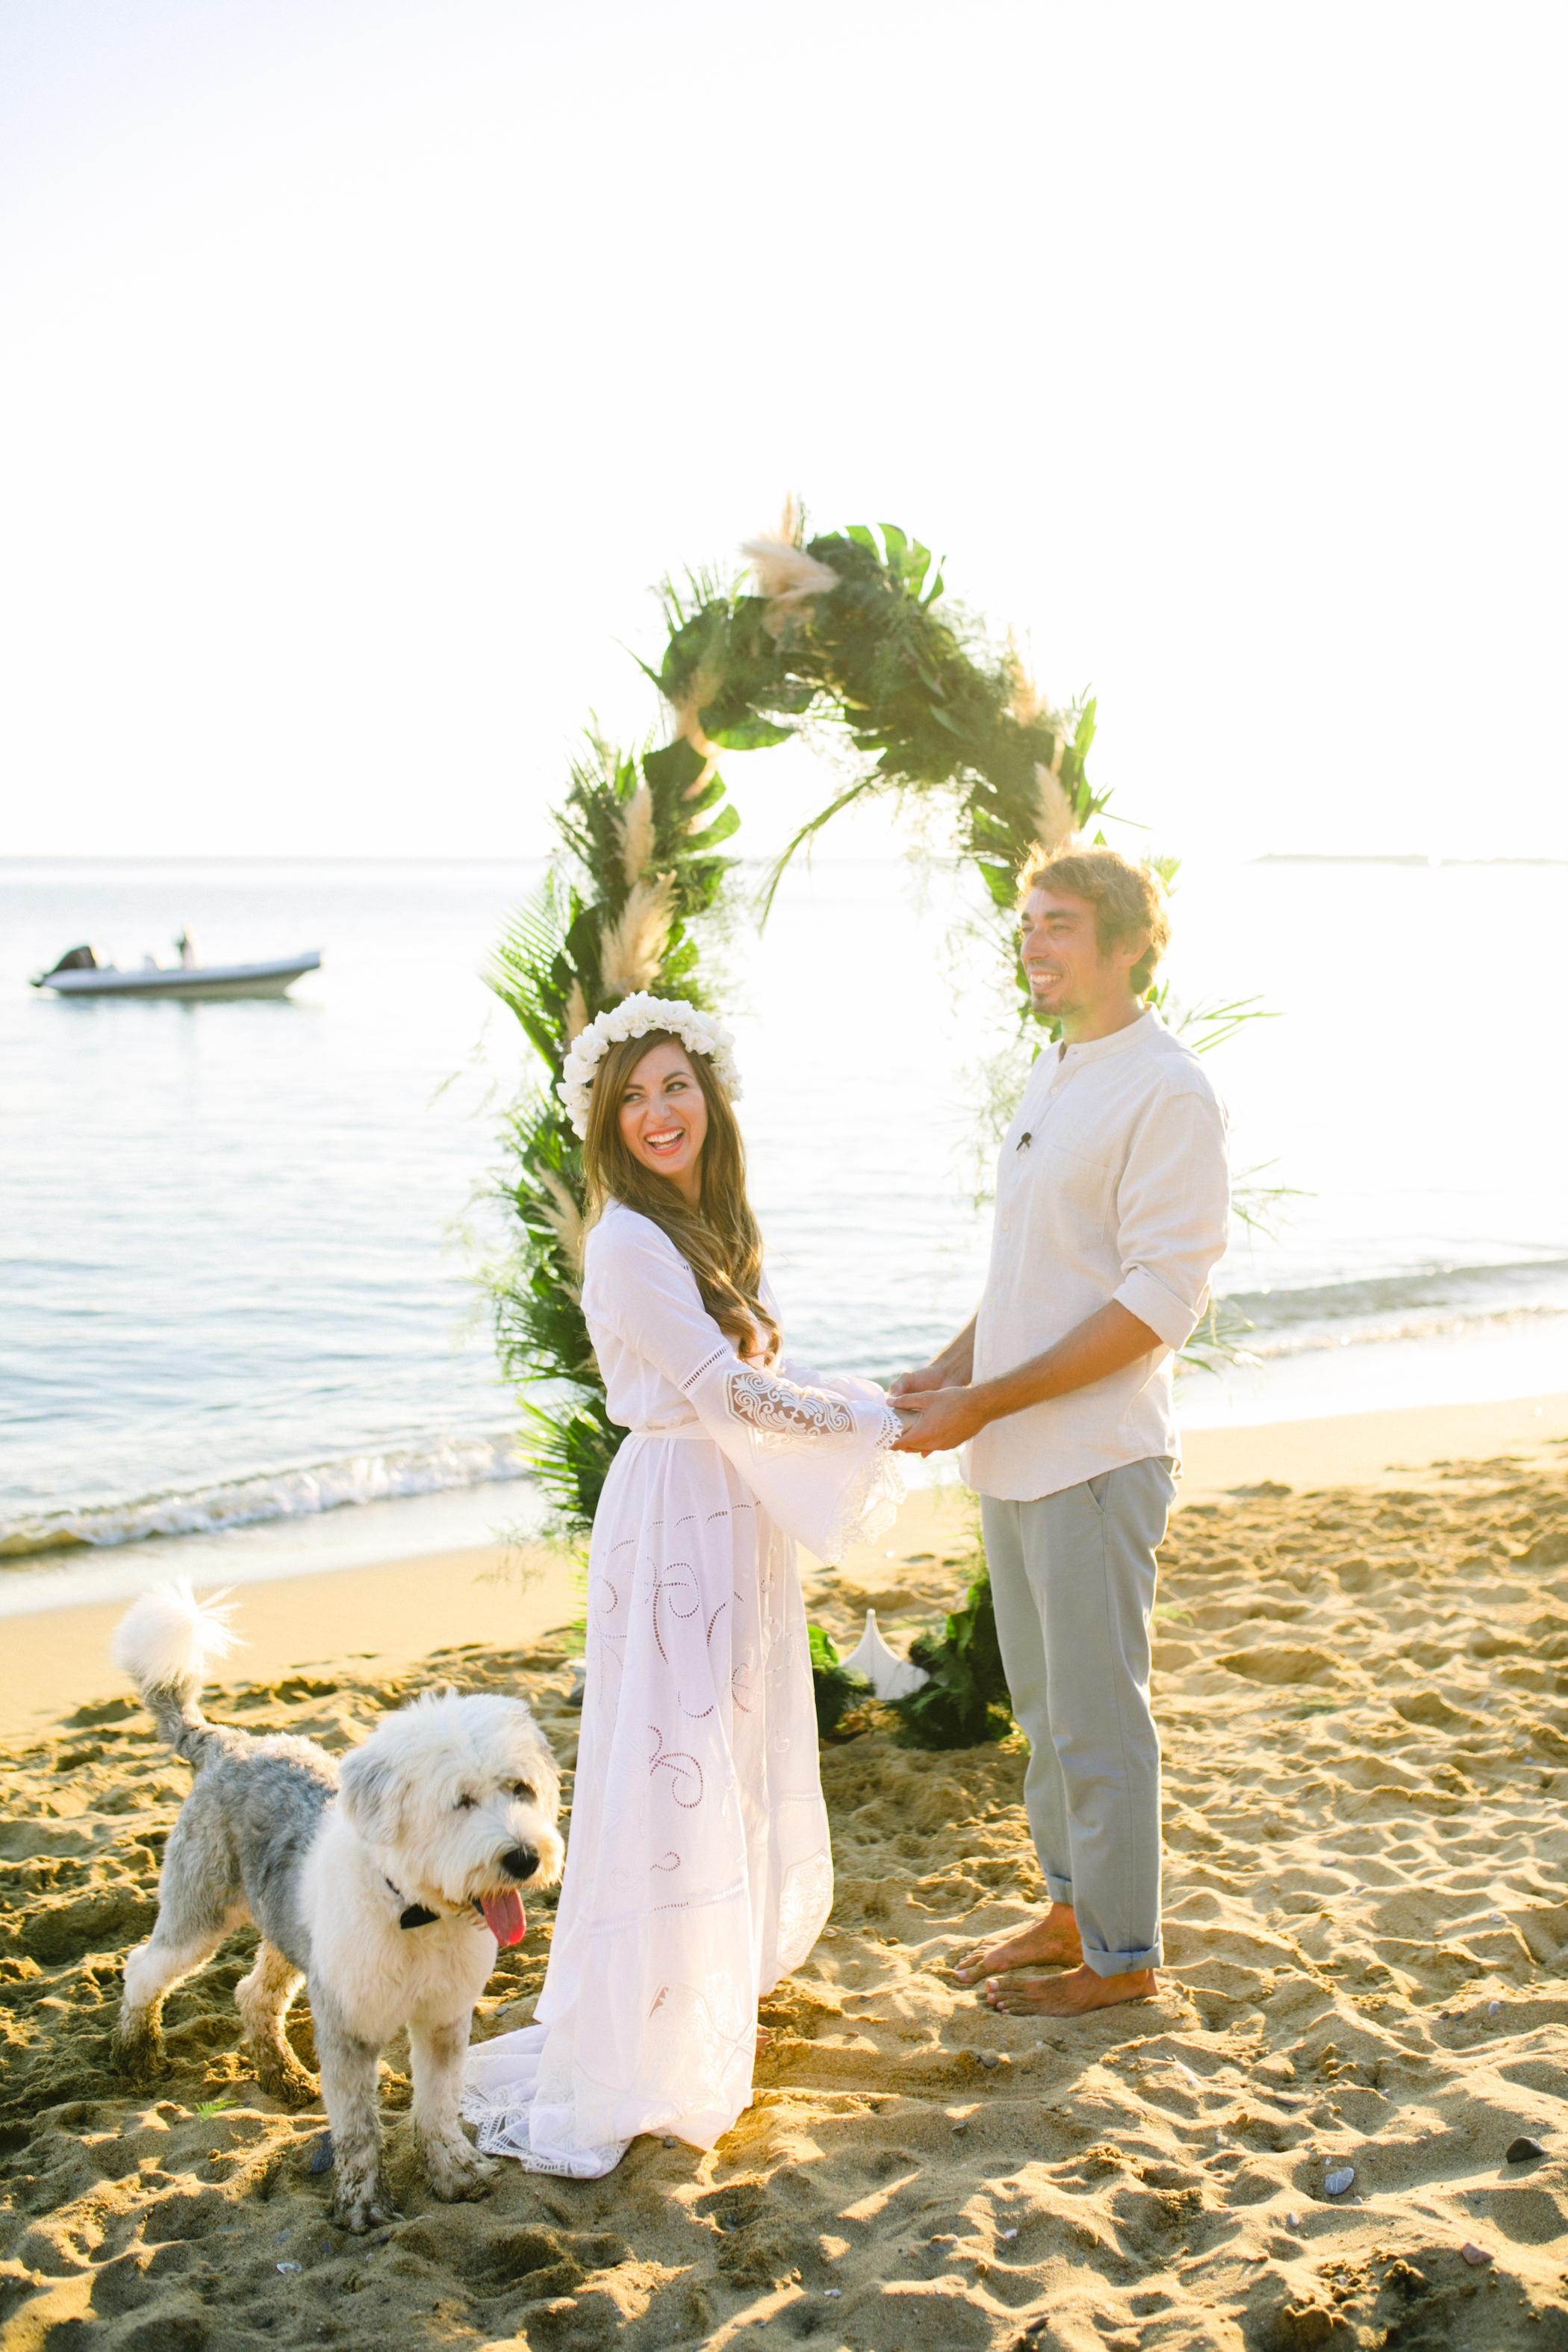 newlyweds with dog on beach